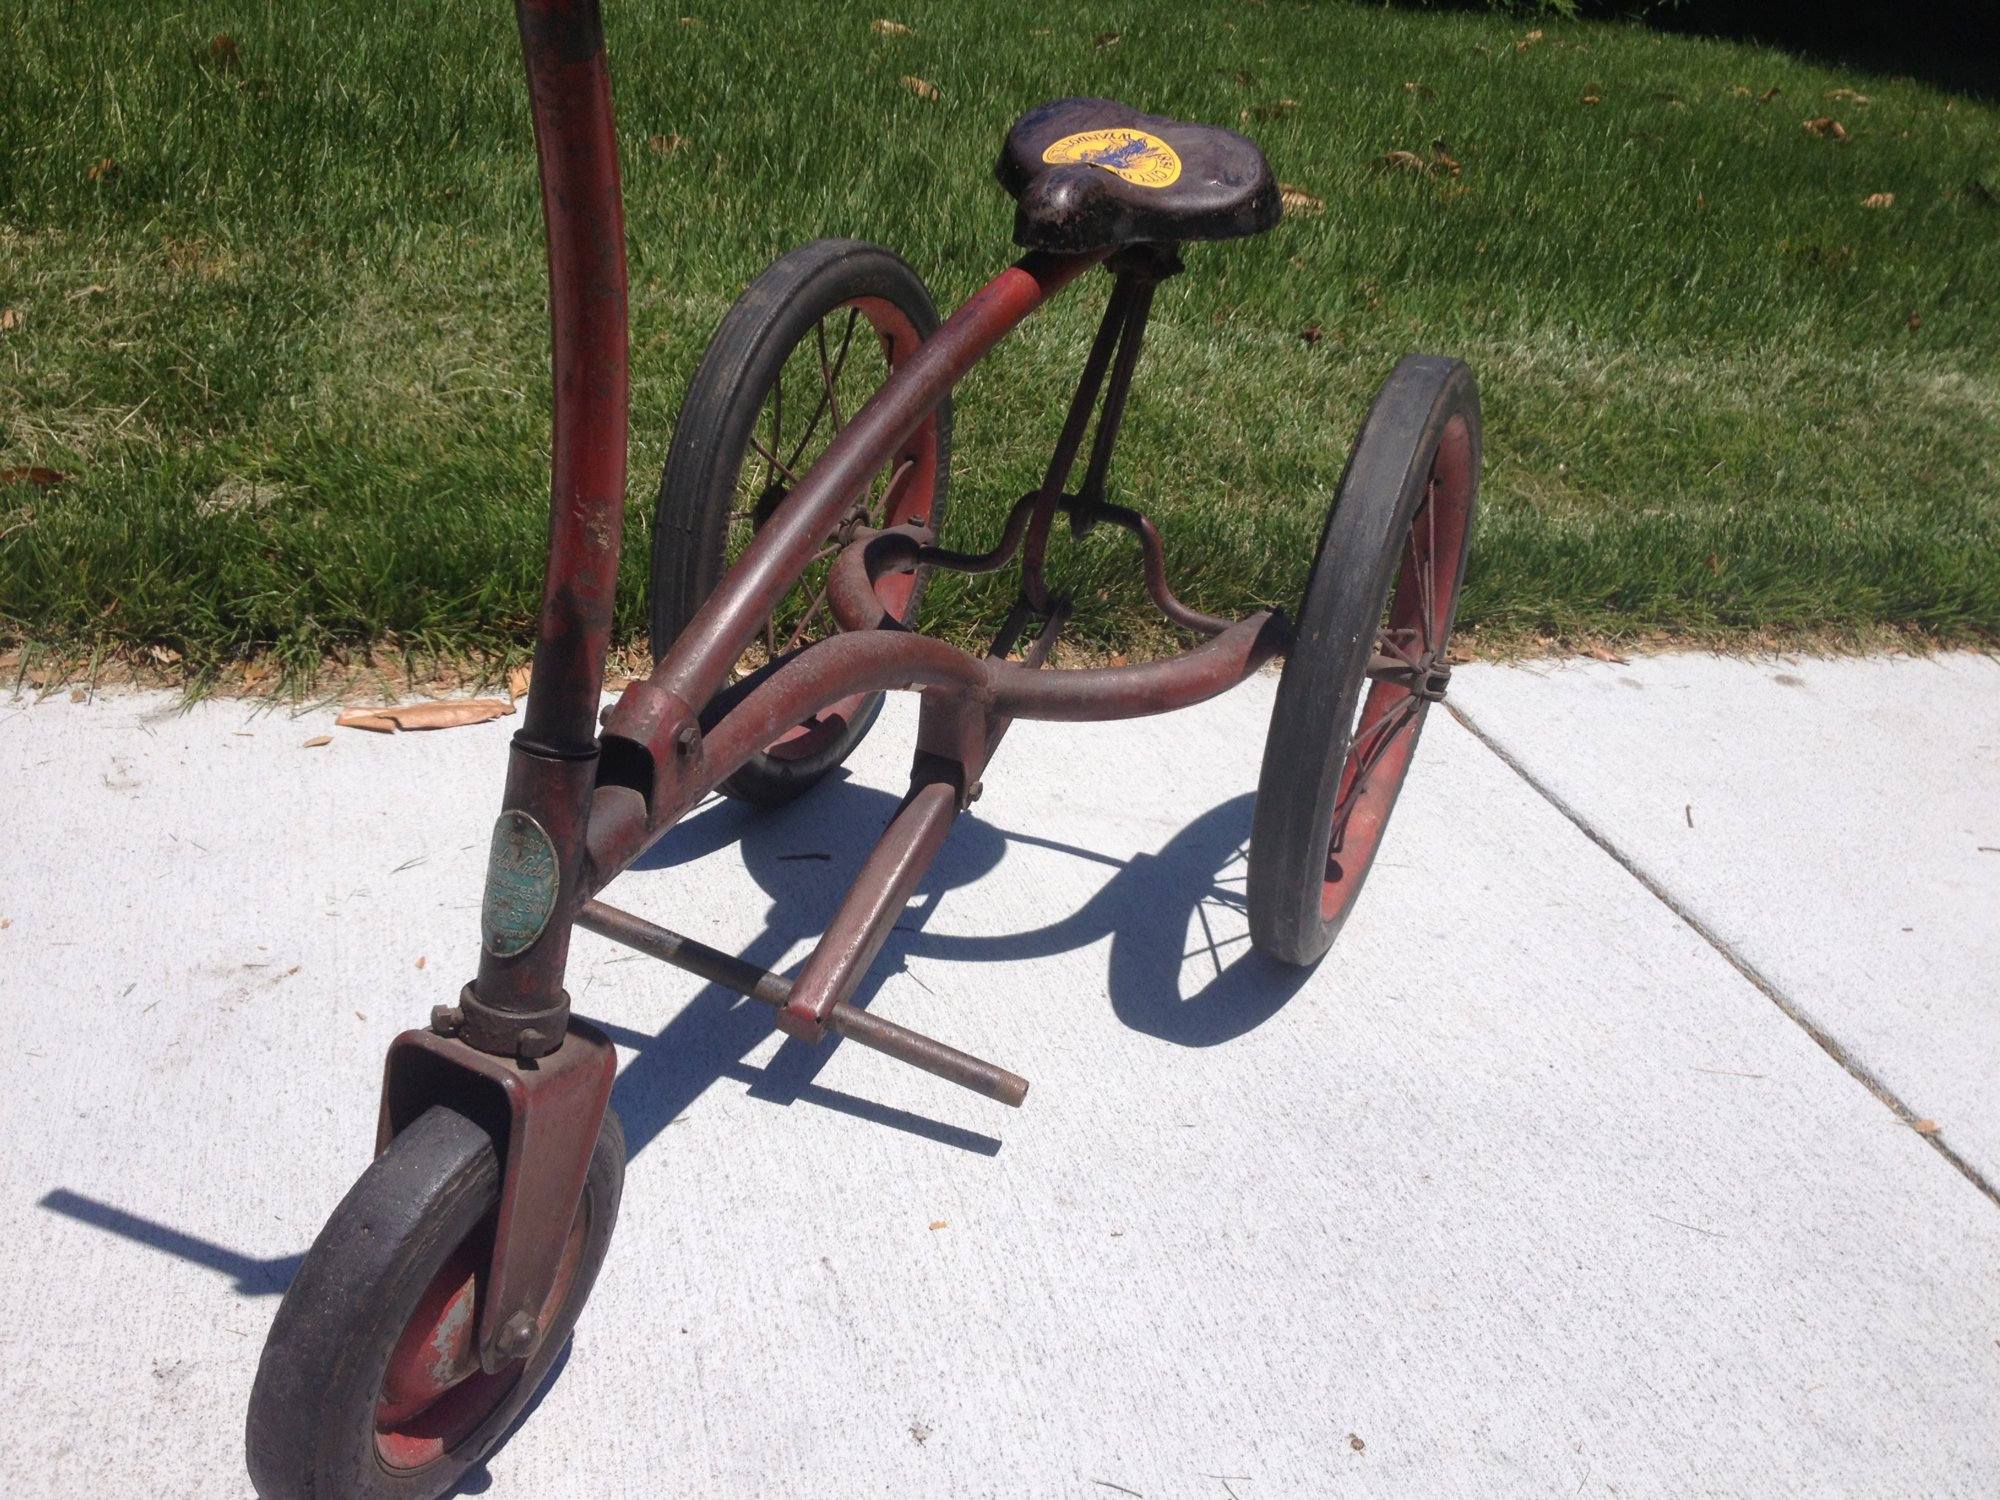 jockey cycle (3).JPG